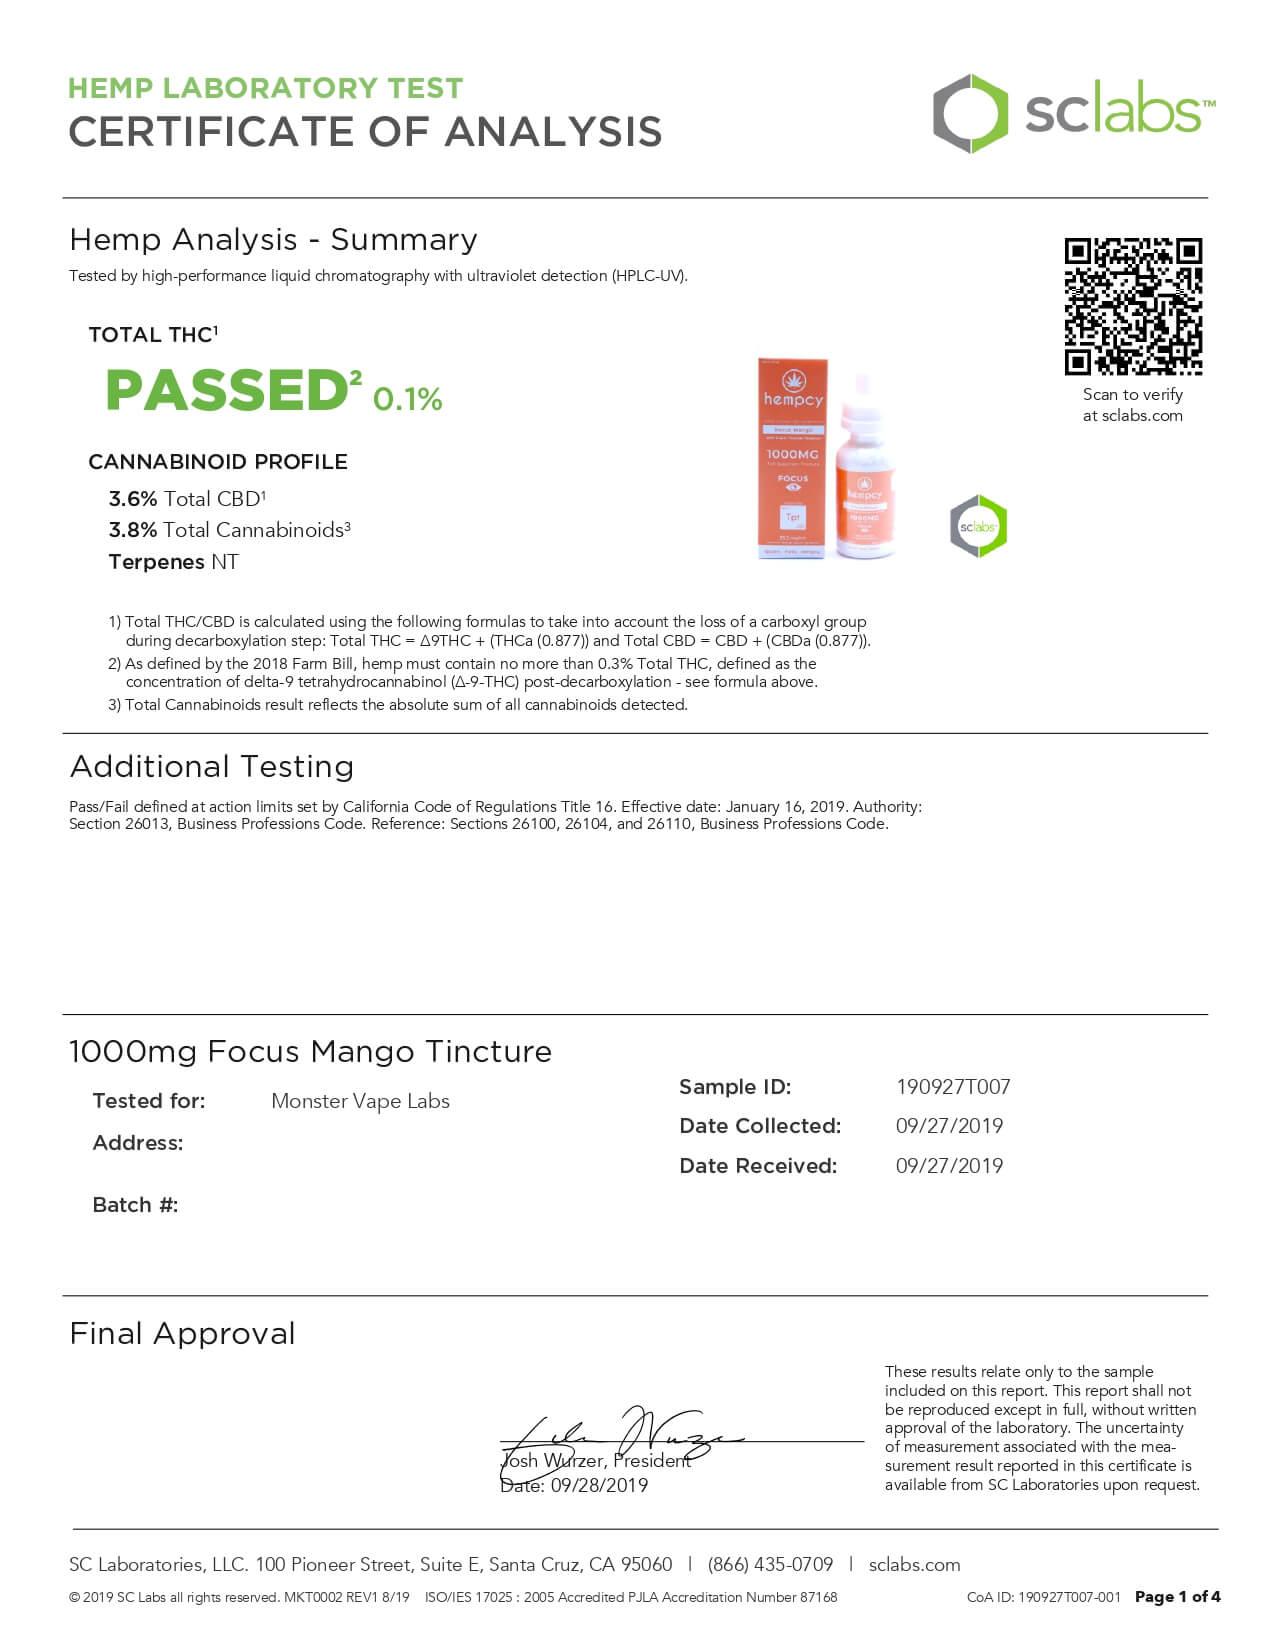 Hempcy CBD Edible Focus Mango 1000mg Lab Report